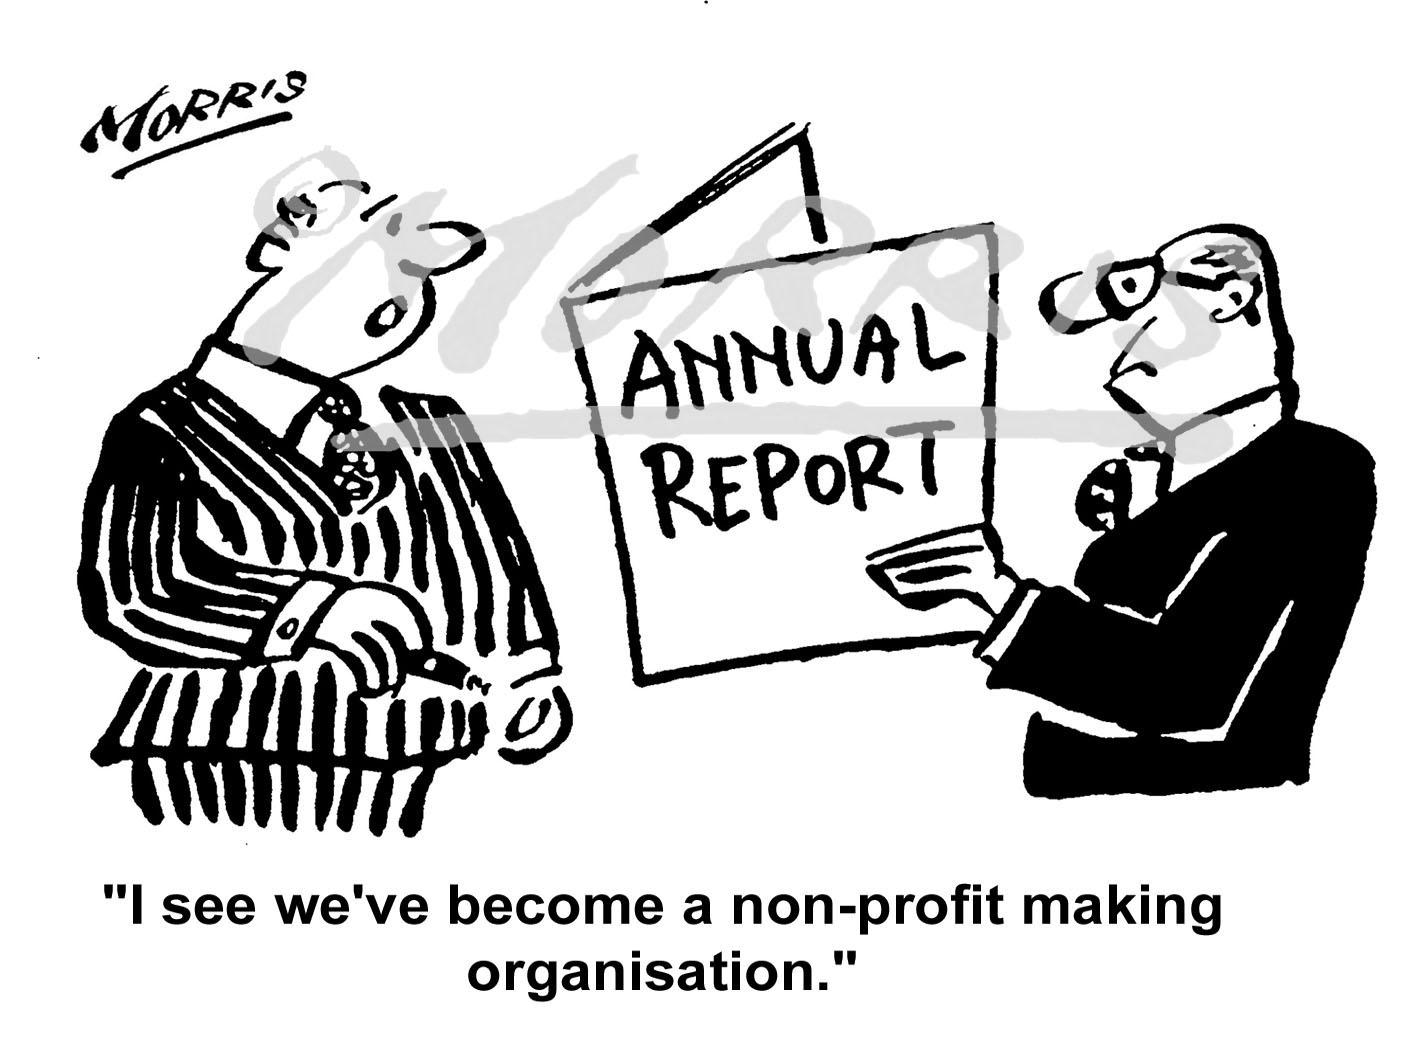 Company annual report cartoon Ref: 0416bw